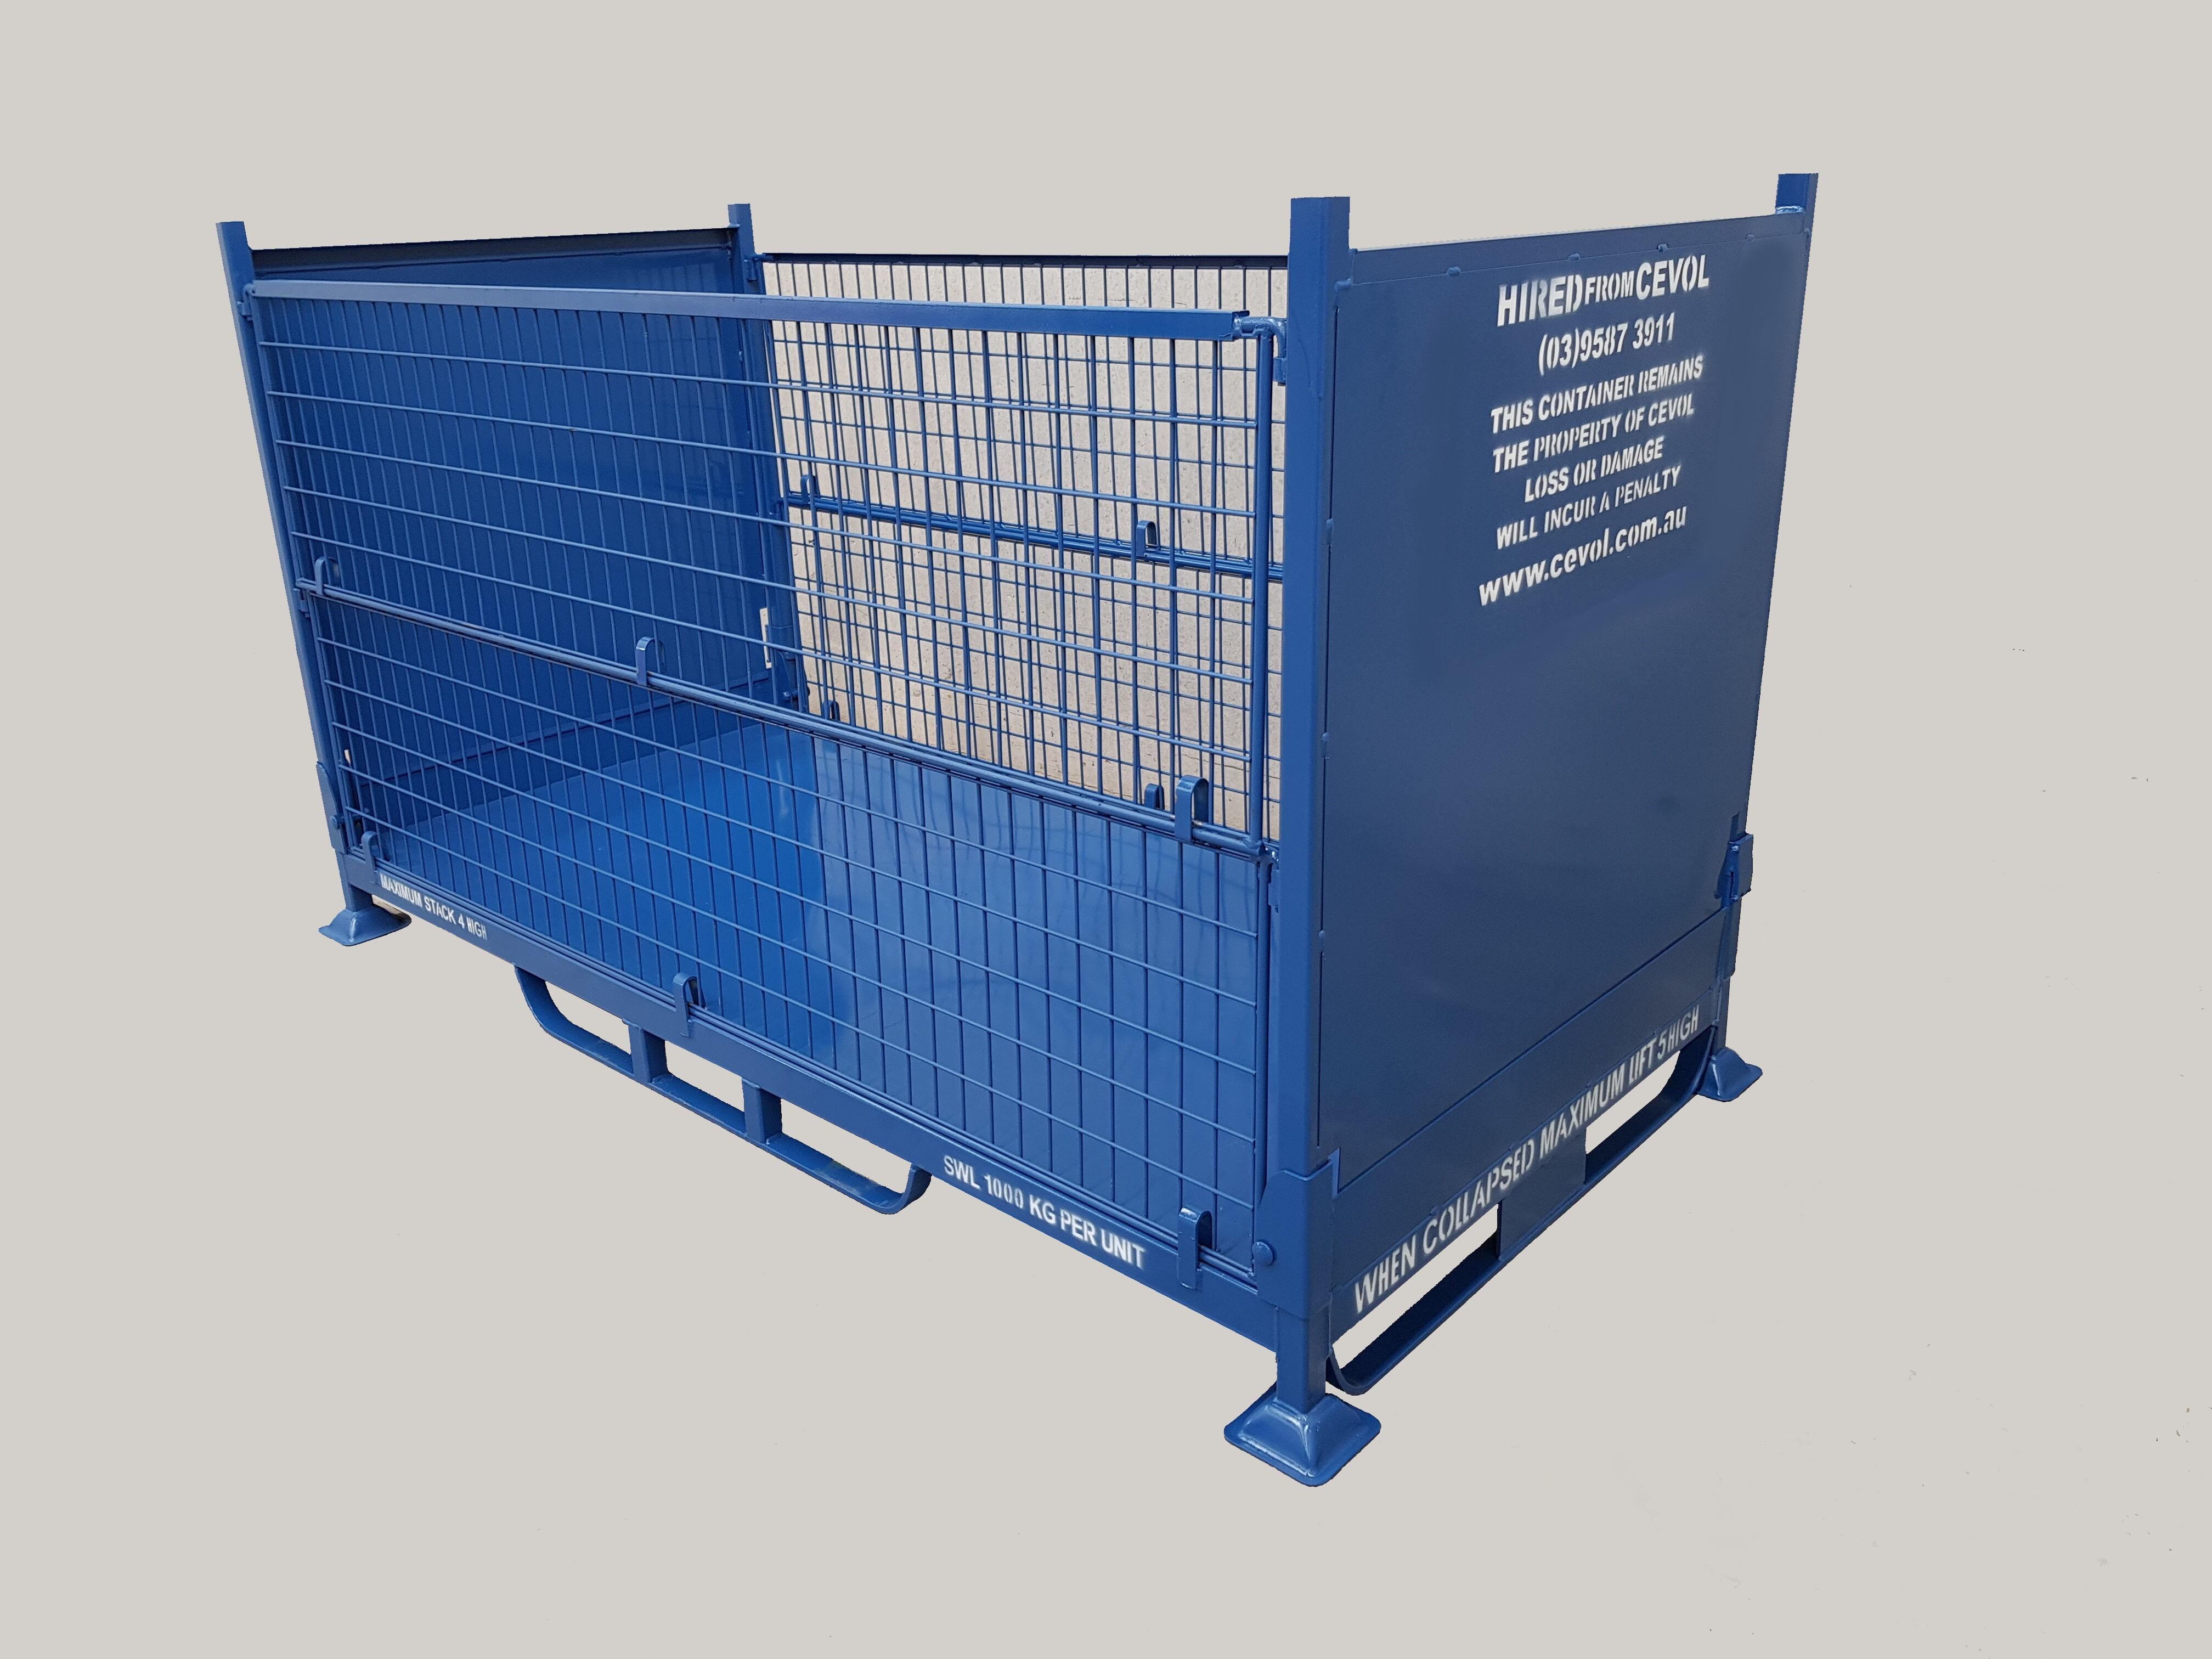 CBM.1R - Folding Bulk Mesh Pallet with half drop front & back gates